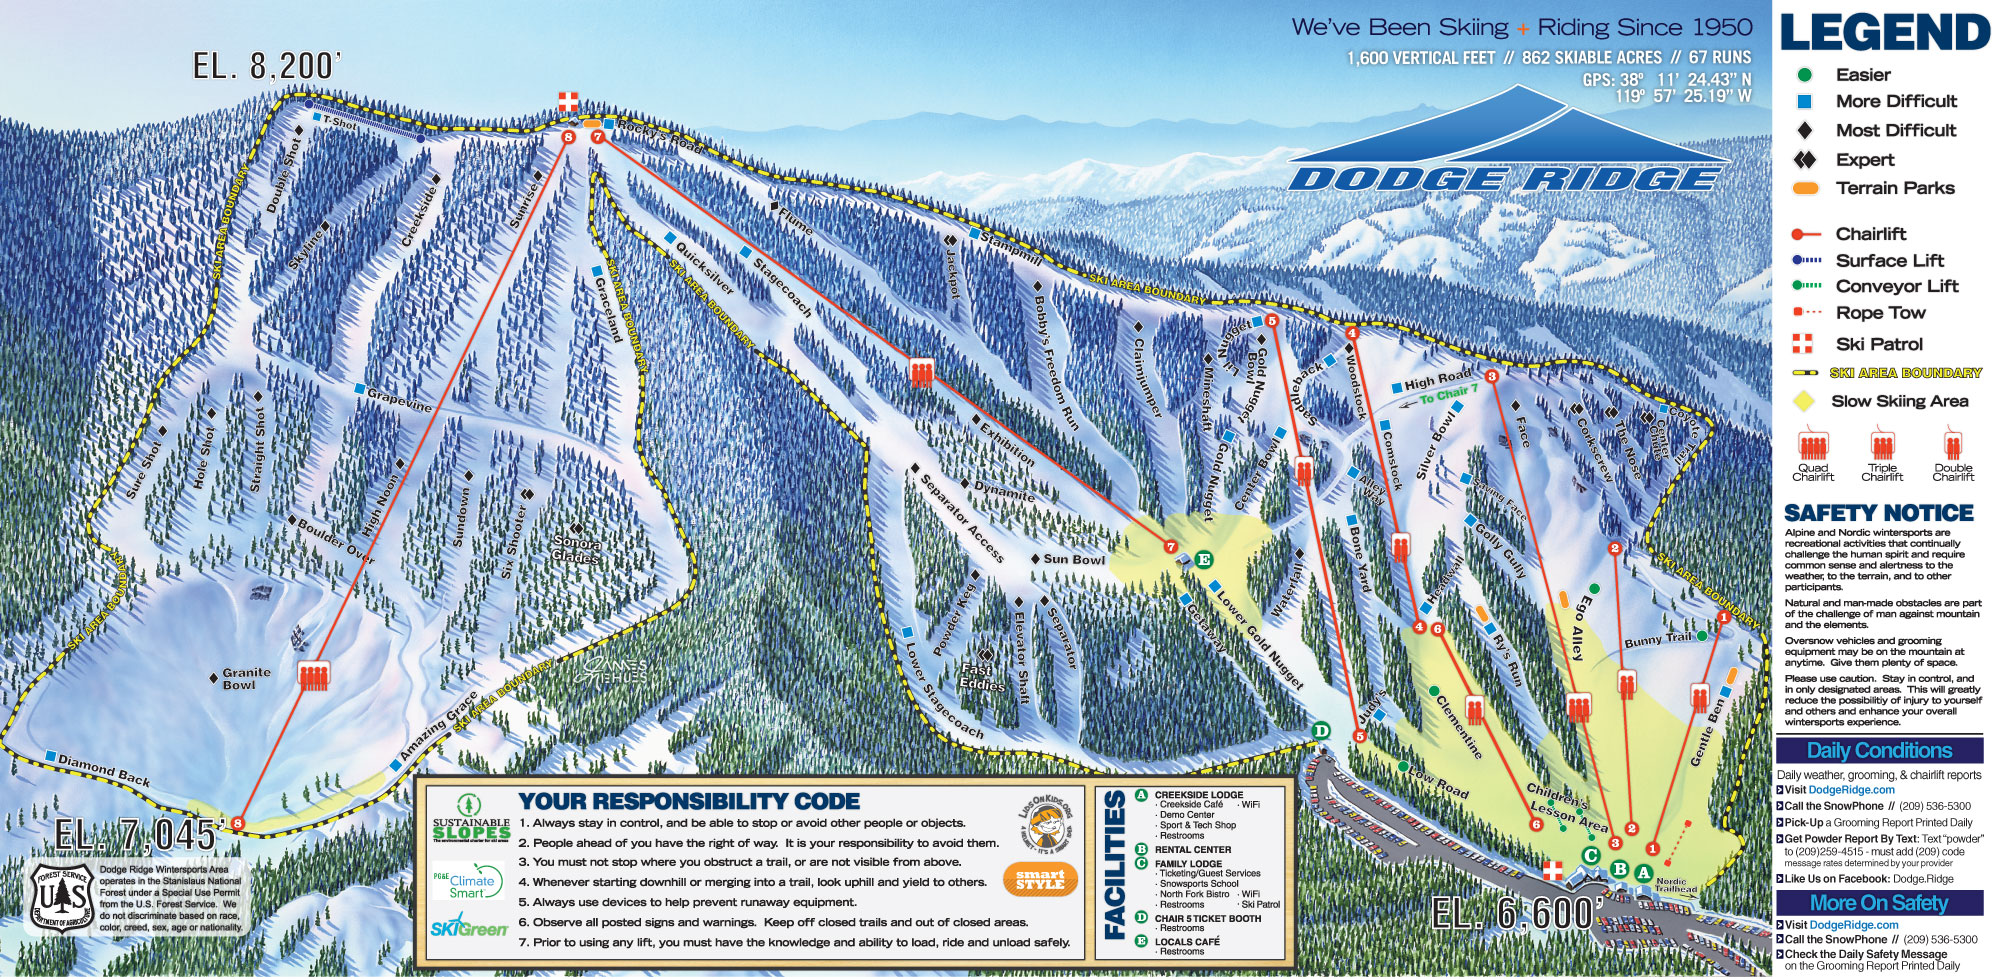 Mountain View Dodge >> Brochure & Trail Map - Dodge Ridge